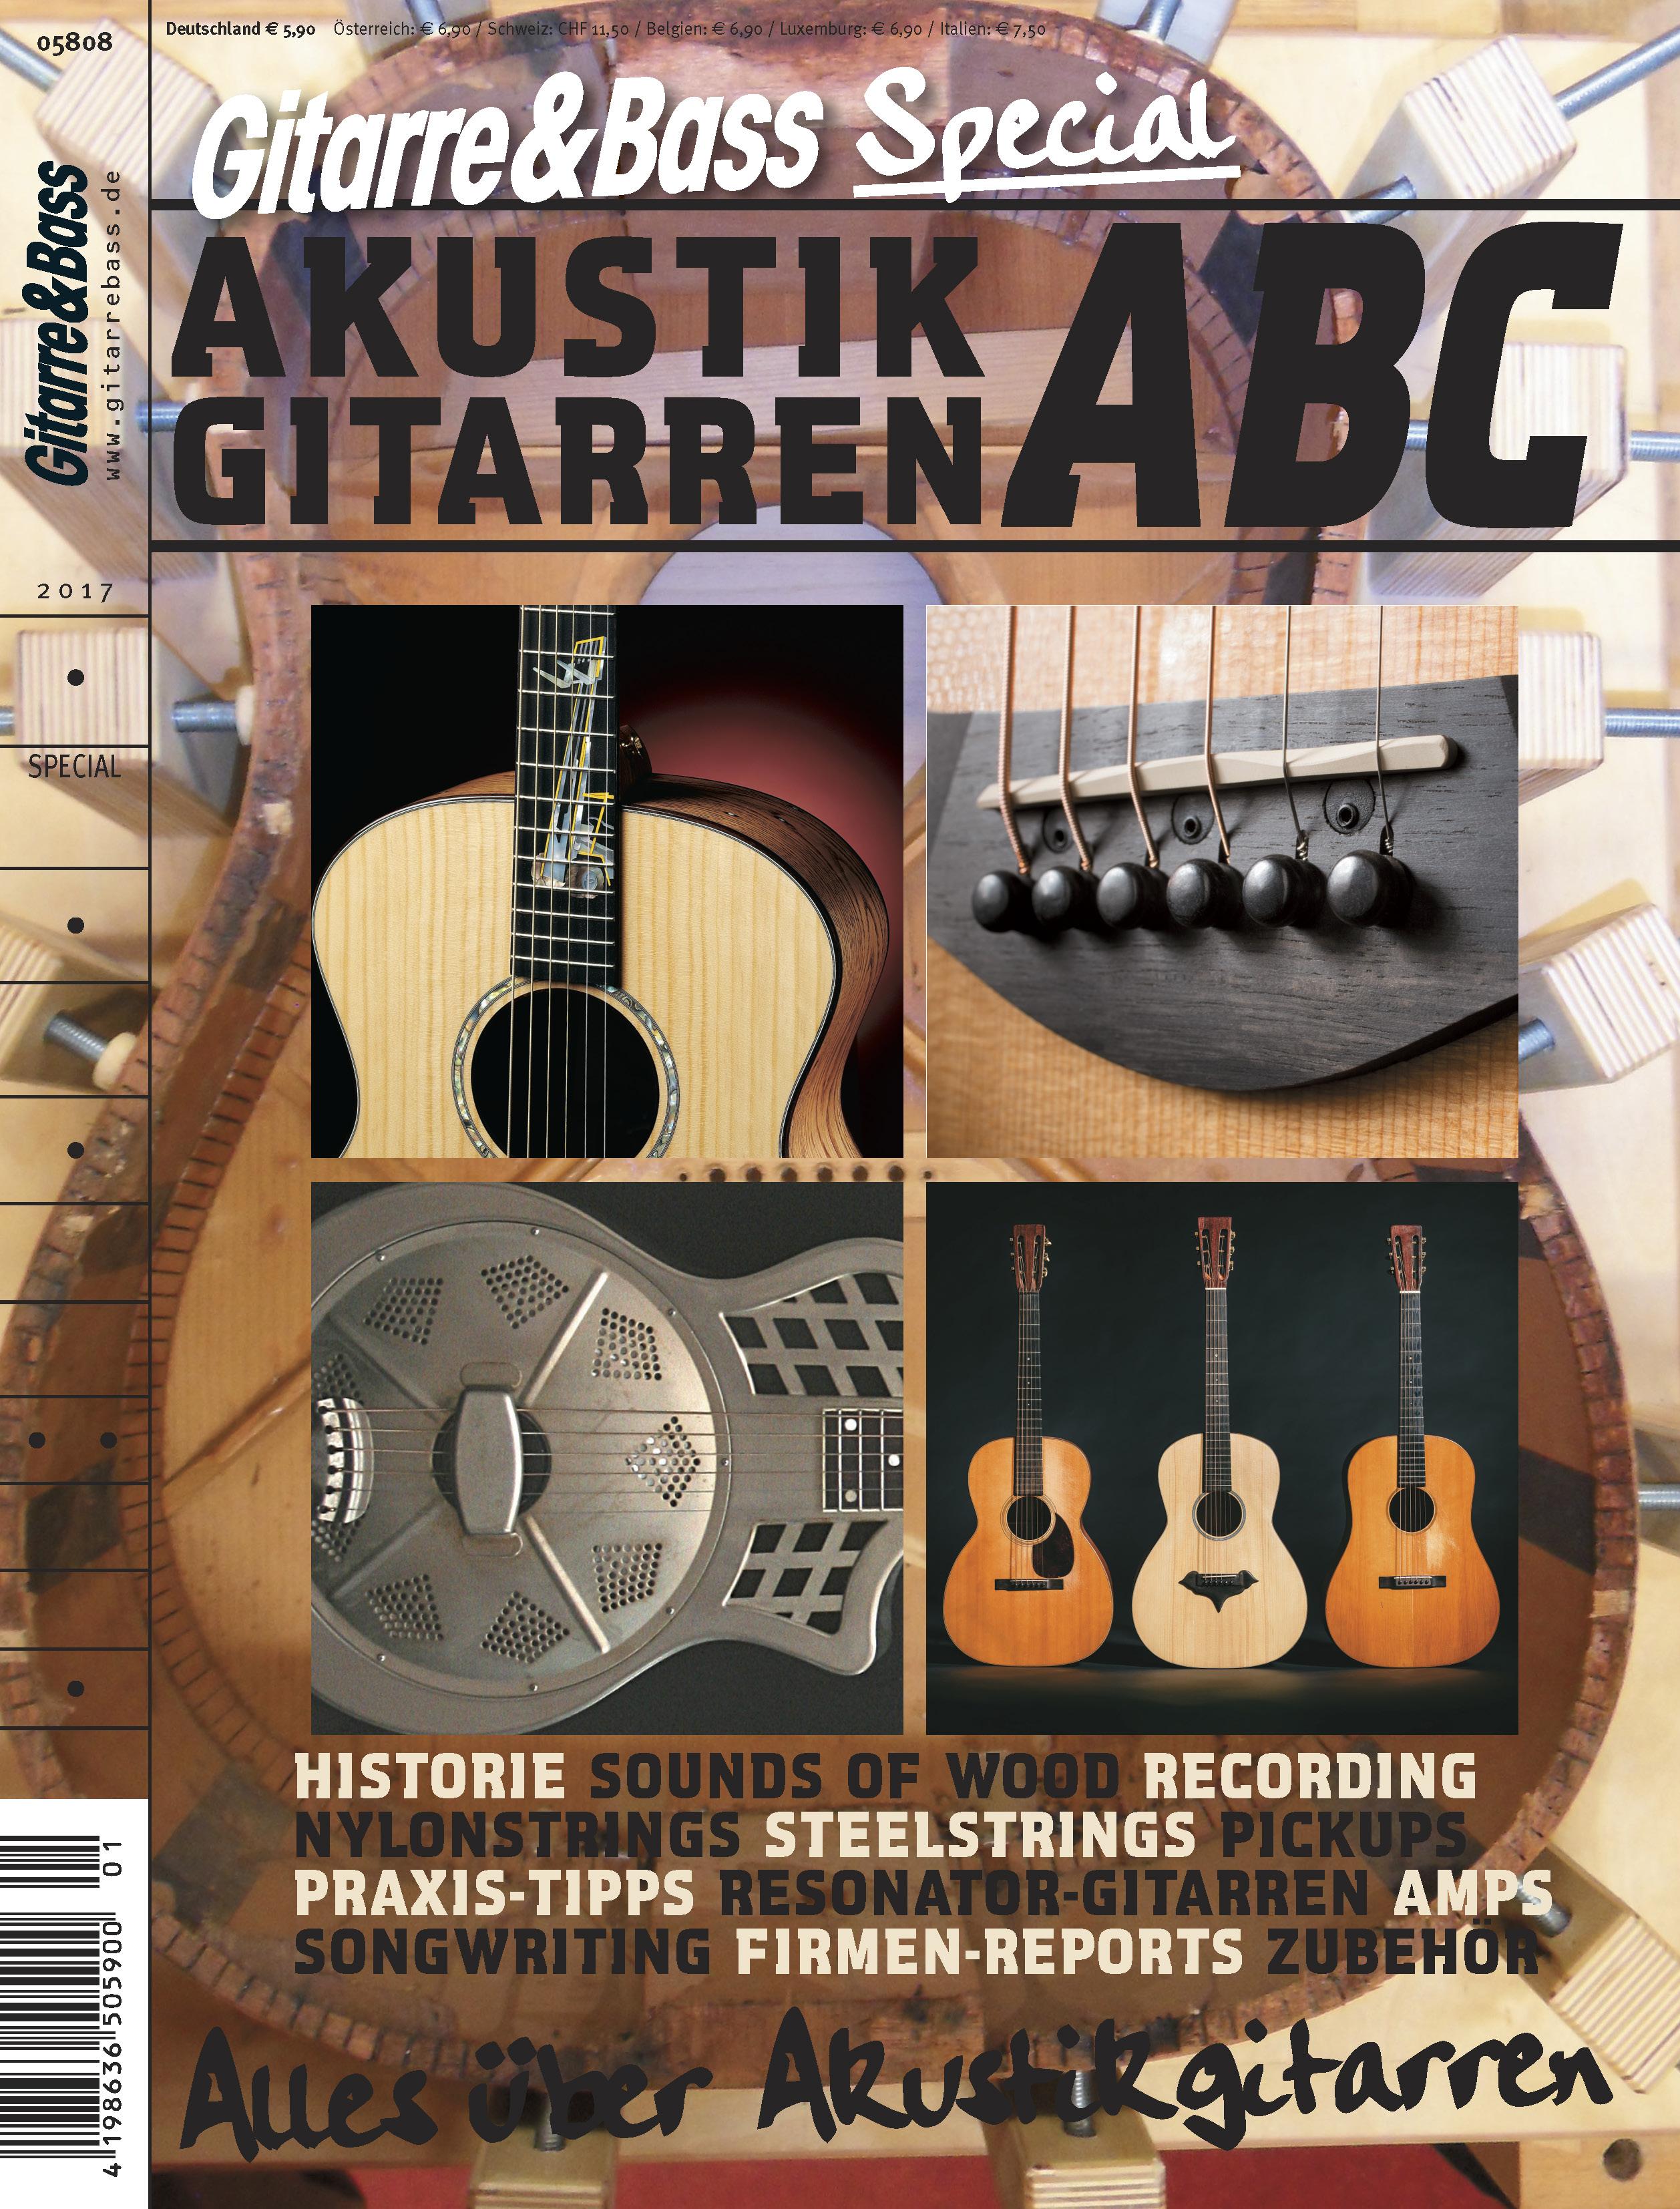 Produkt: Akustikgitarren ABC – Alles über Akustik Gitarren